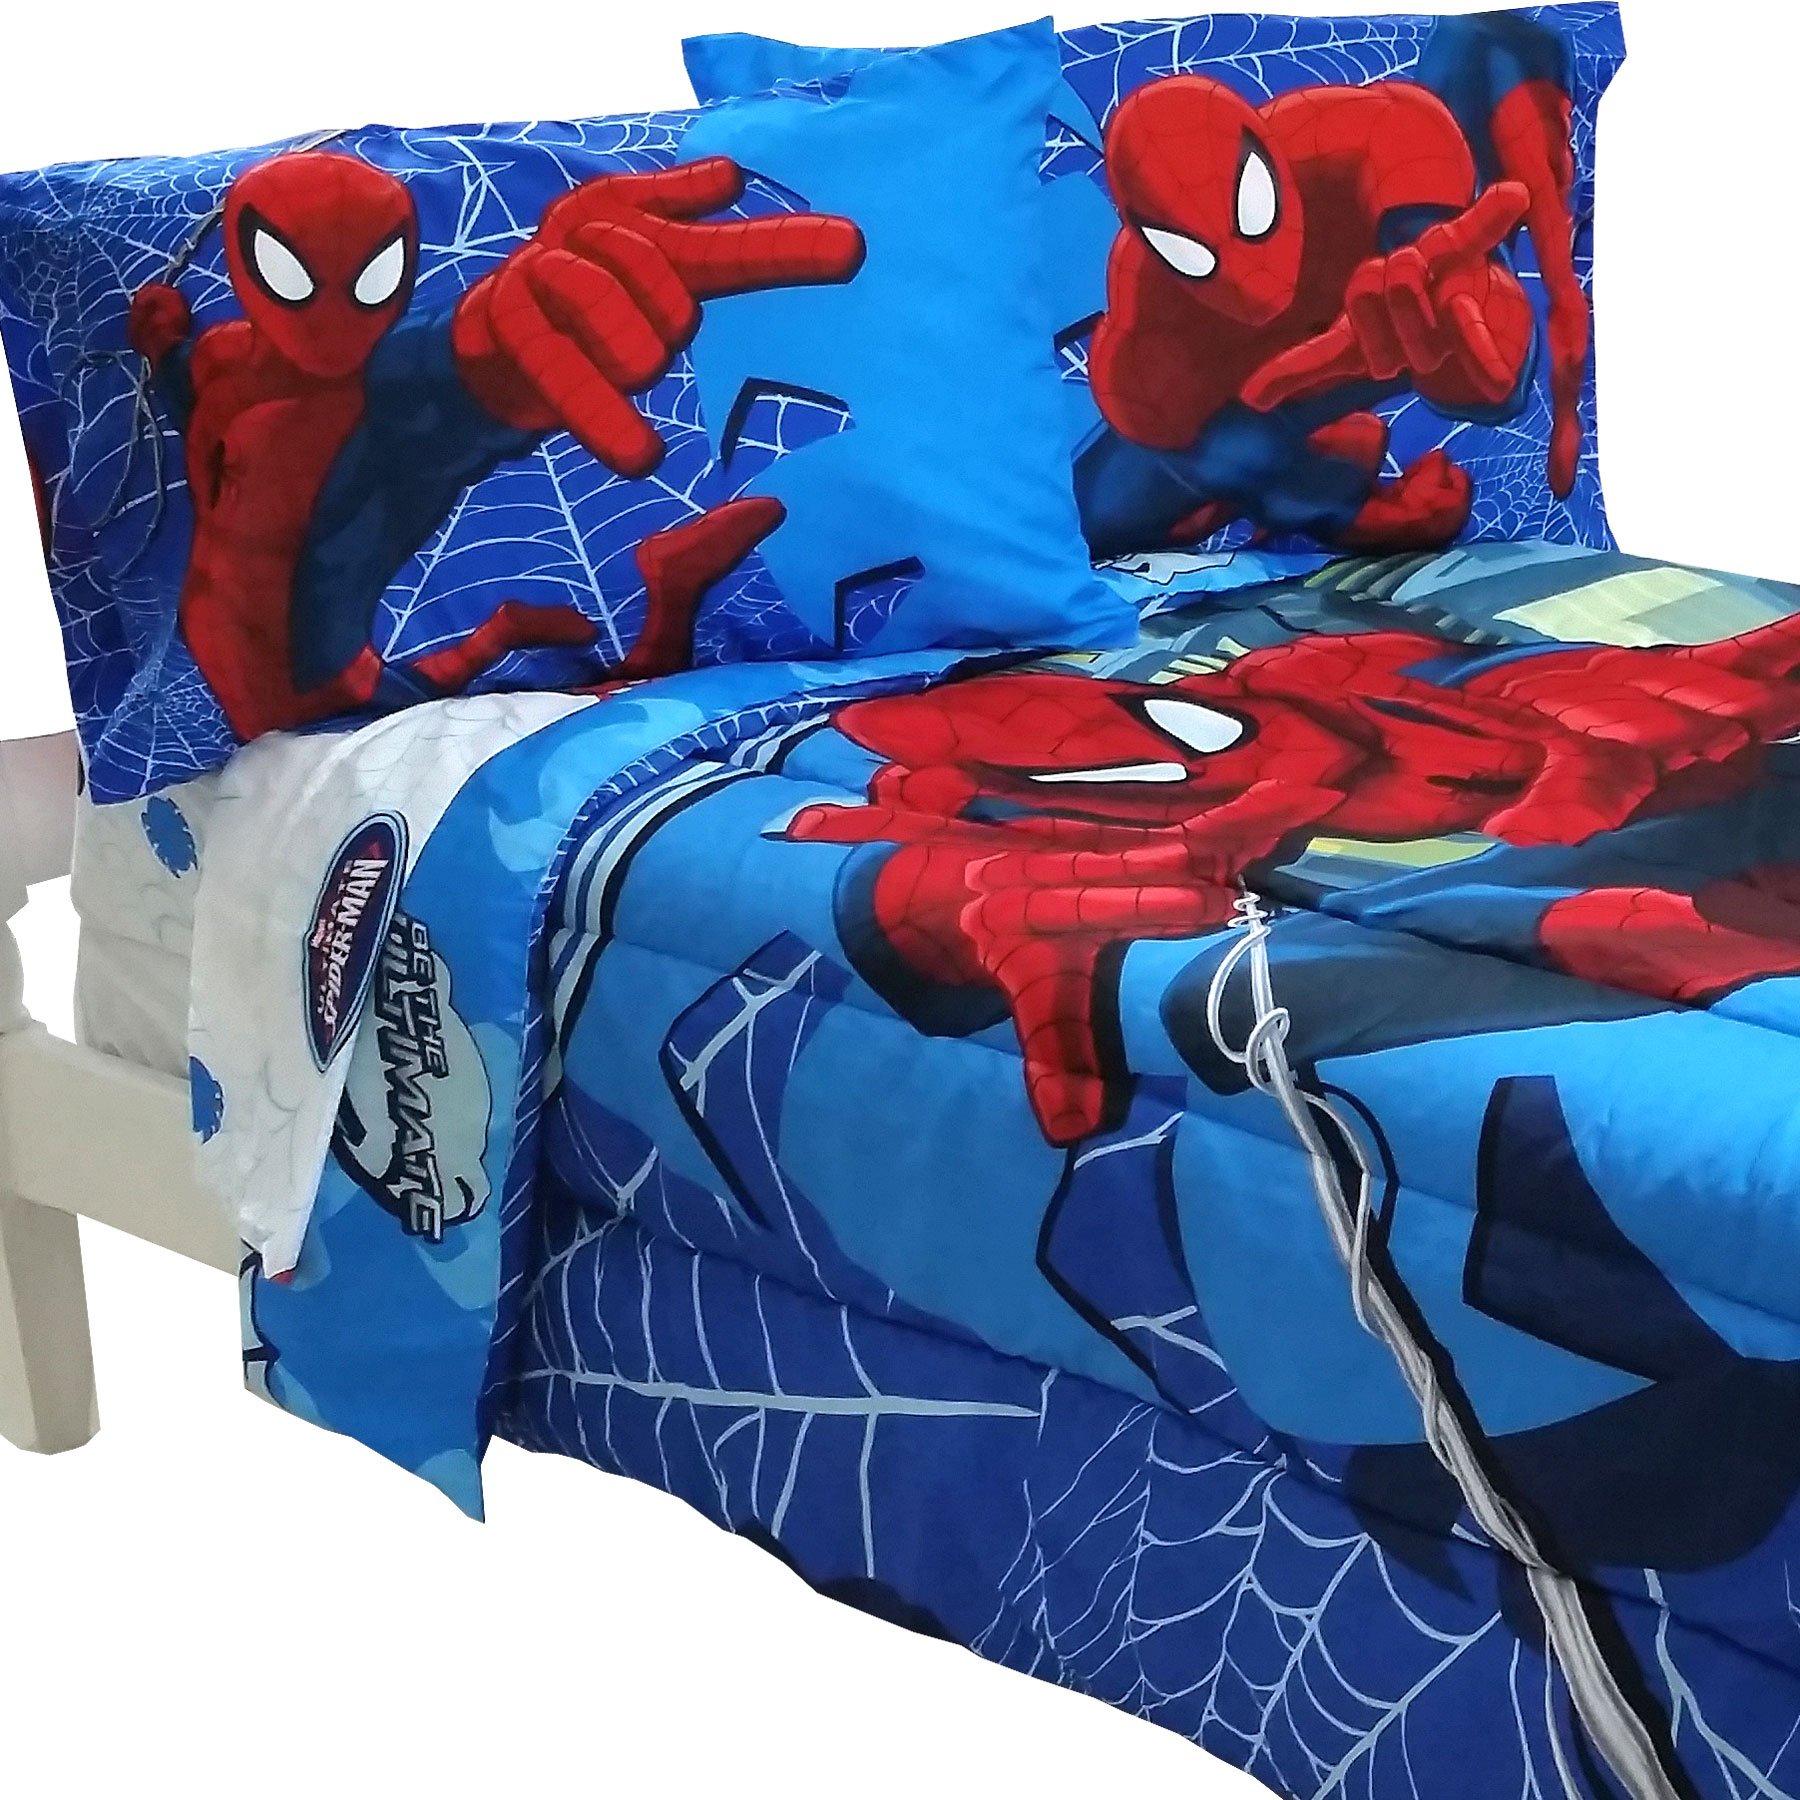 5pc Marvel Comics SpiderMan Full Bedding Set Spidey Astonish Comforter and Sheet Set